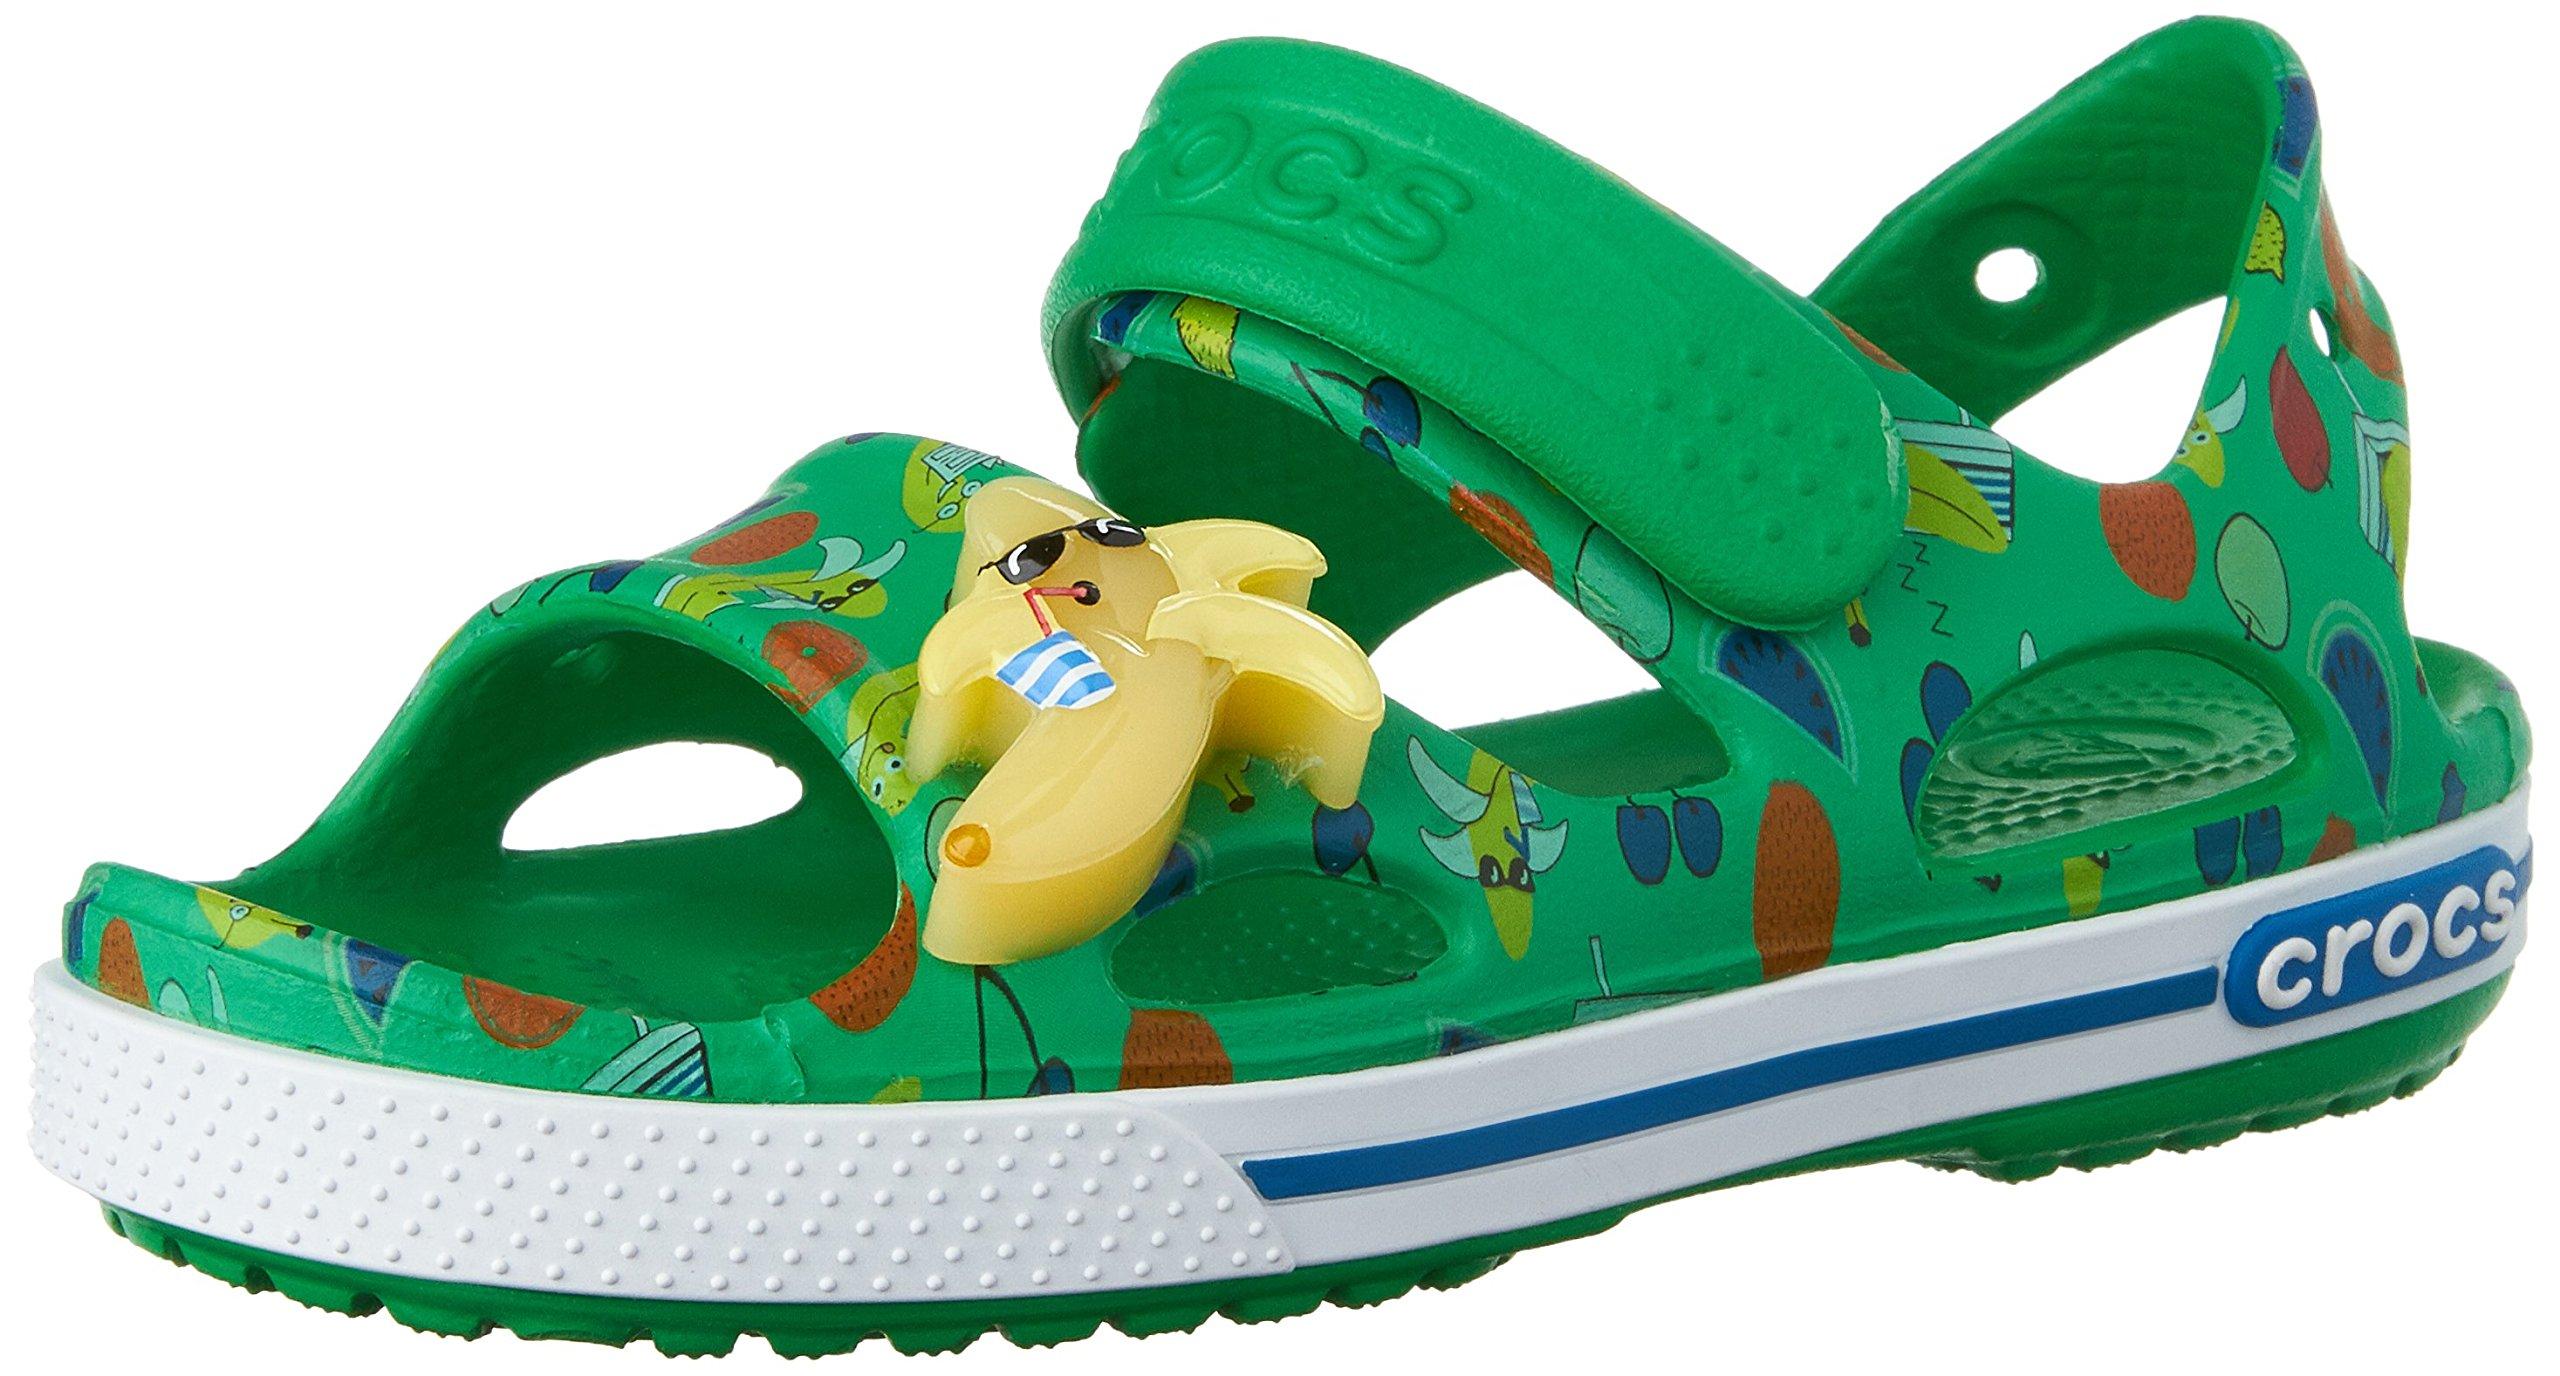 crocs Crocband II Banana LED Sandal (Toddler/Little Kid), Grass Green, 8 M US Toddler by Crocs